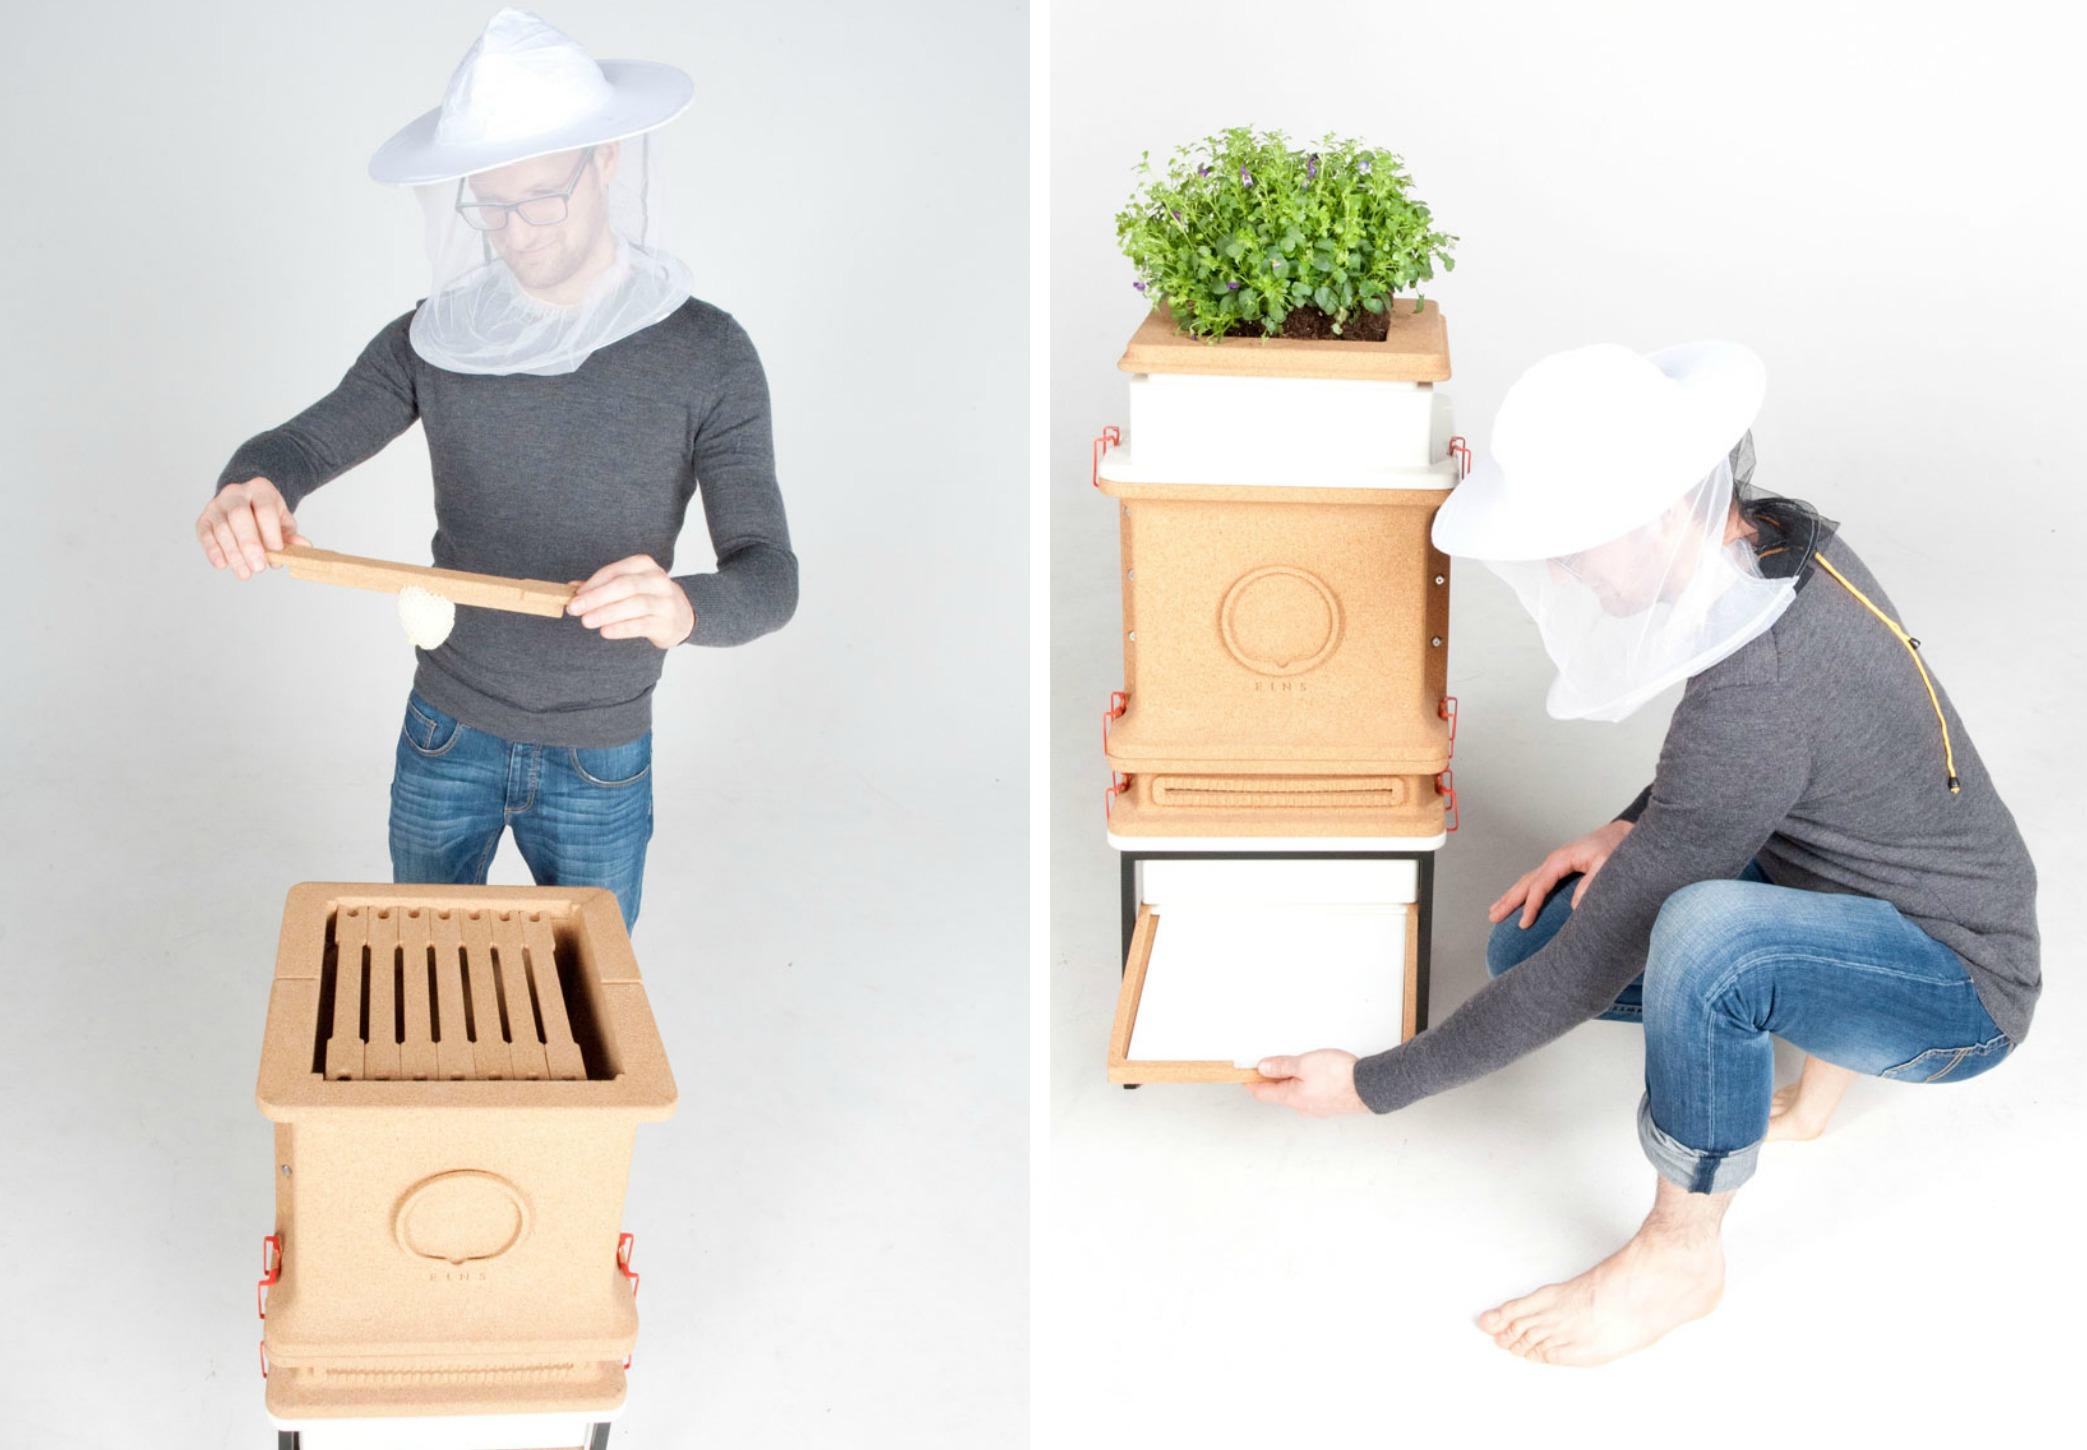 manufaktur eins, home beehive, maria emmrich, urban beekeeper, beehive design